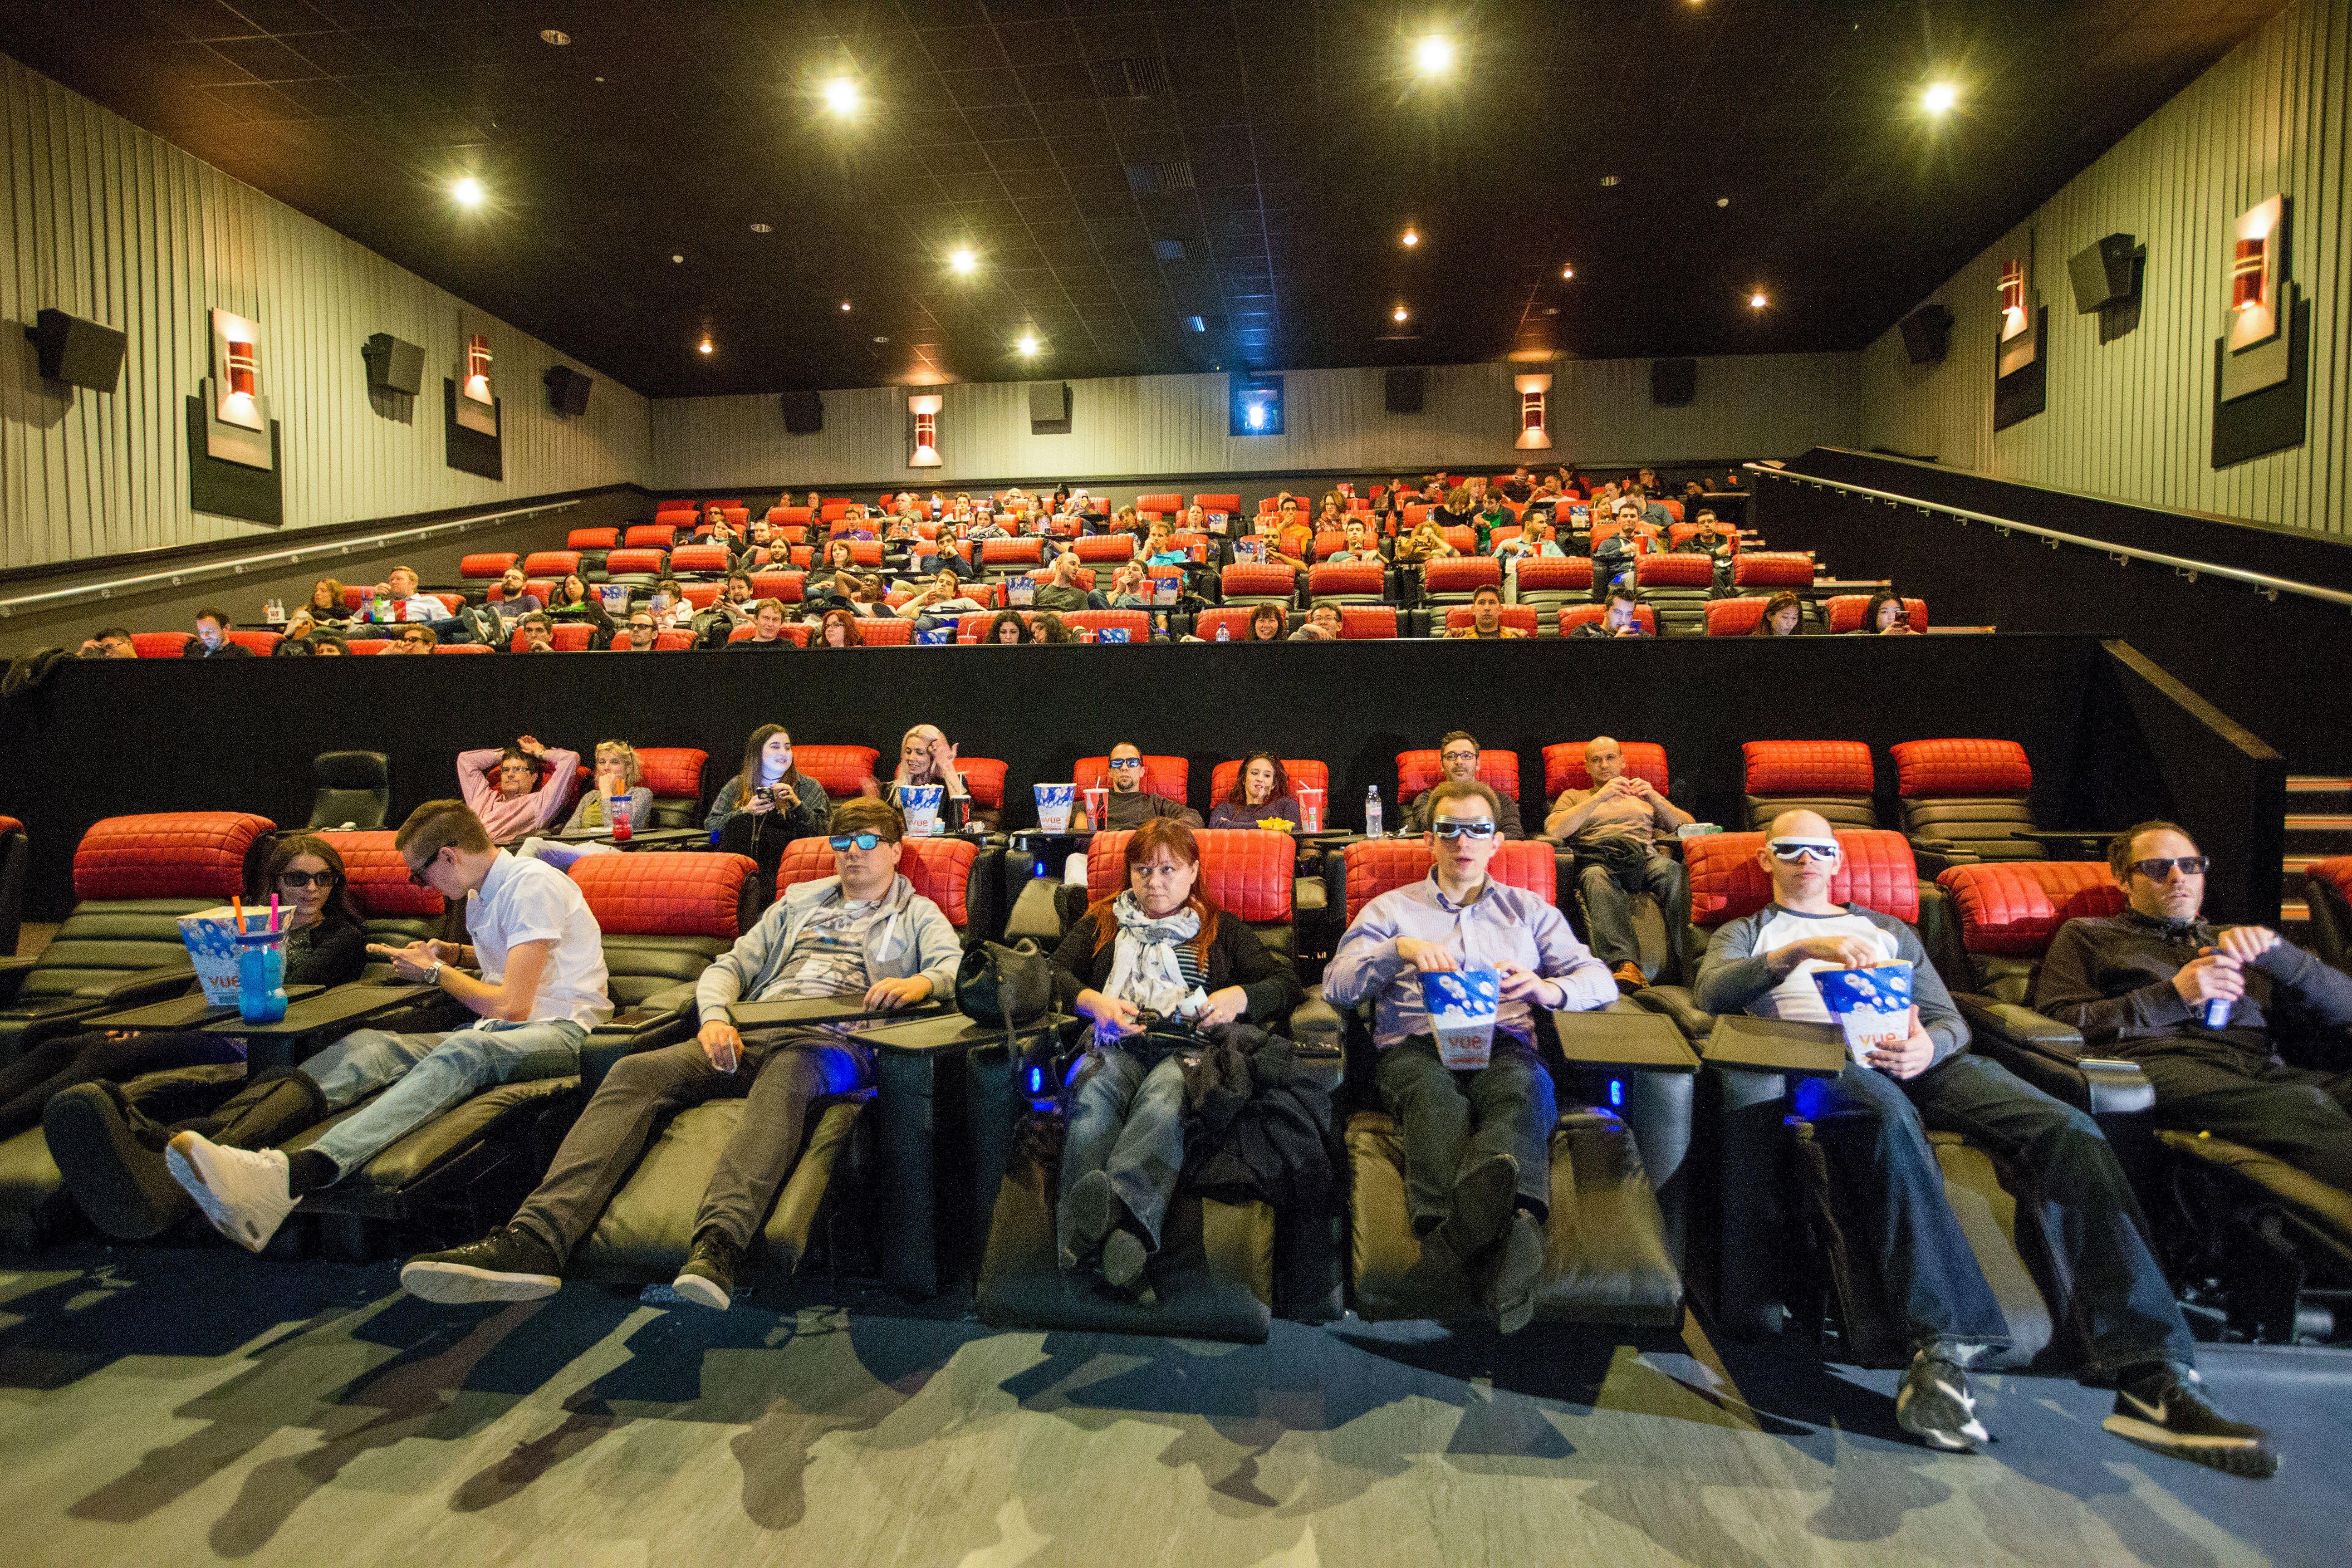 Head Stuck In Reclining Movie Theater